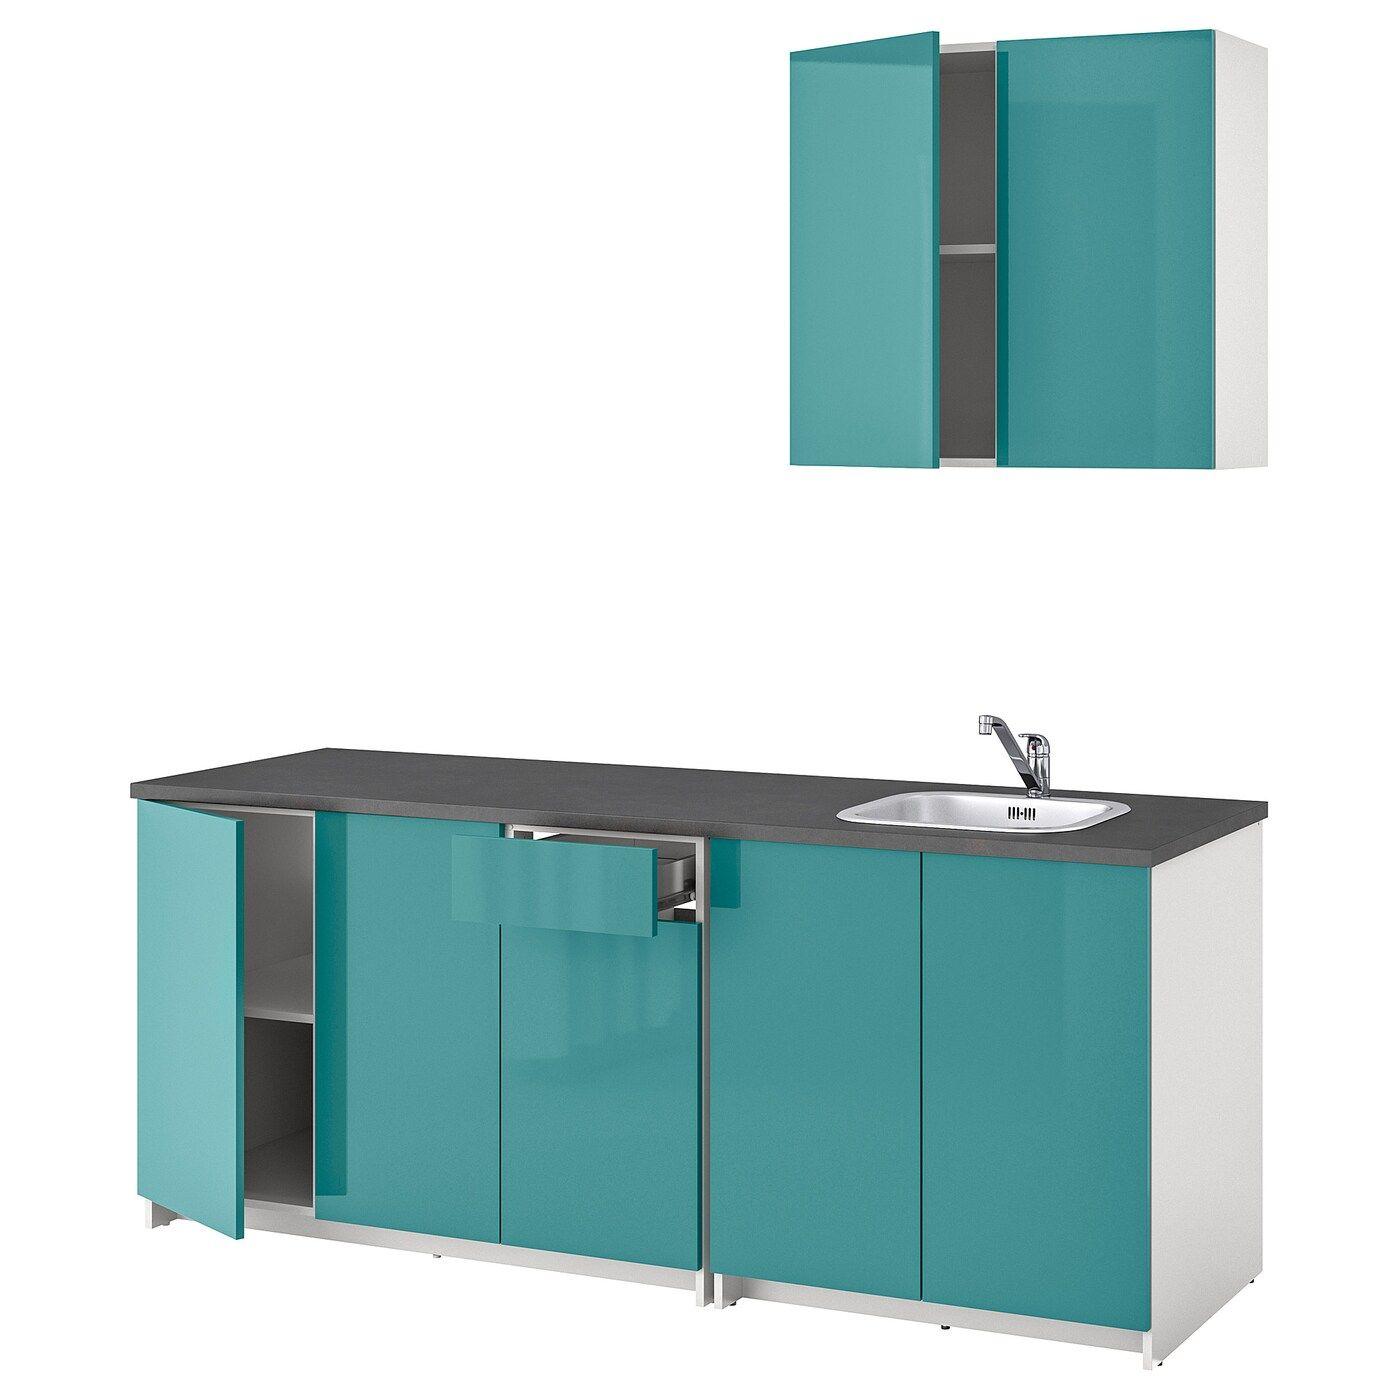 Knoxhult Ikea Kitchen Cabinets Kf In 2020 Ikea Ikea Kitchen Cabinets Furniture Prices